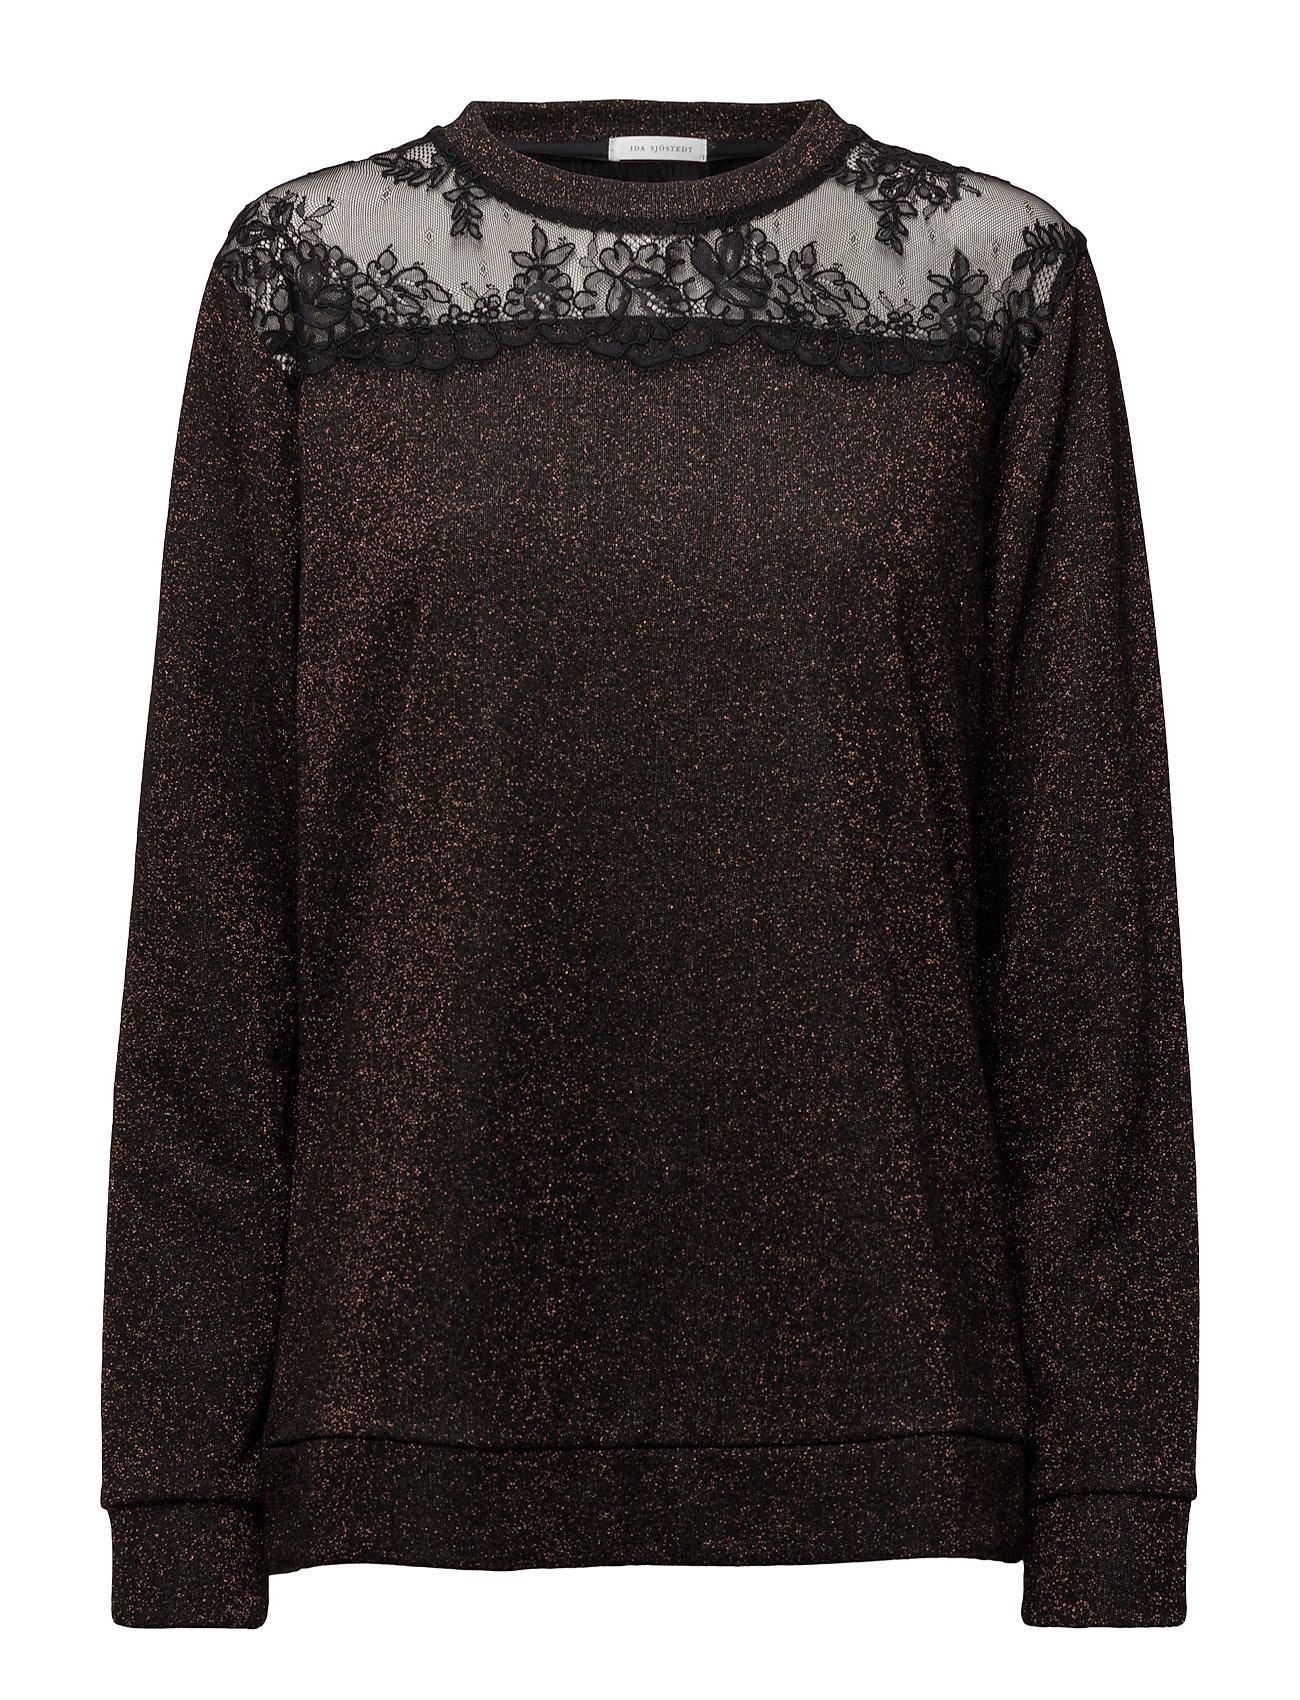 ida sjã¶stedt Lisa sweater på boozt.com dk